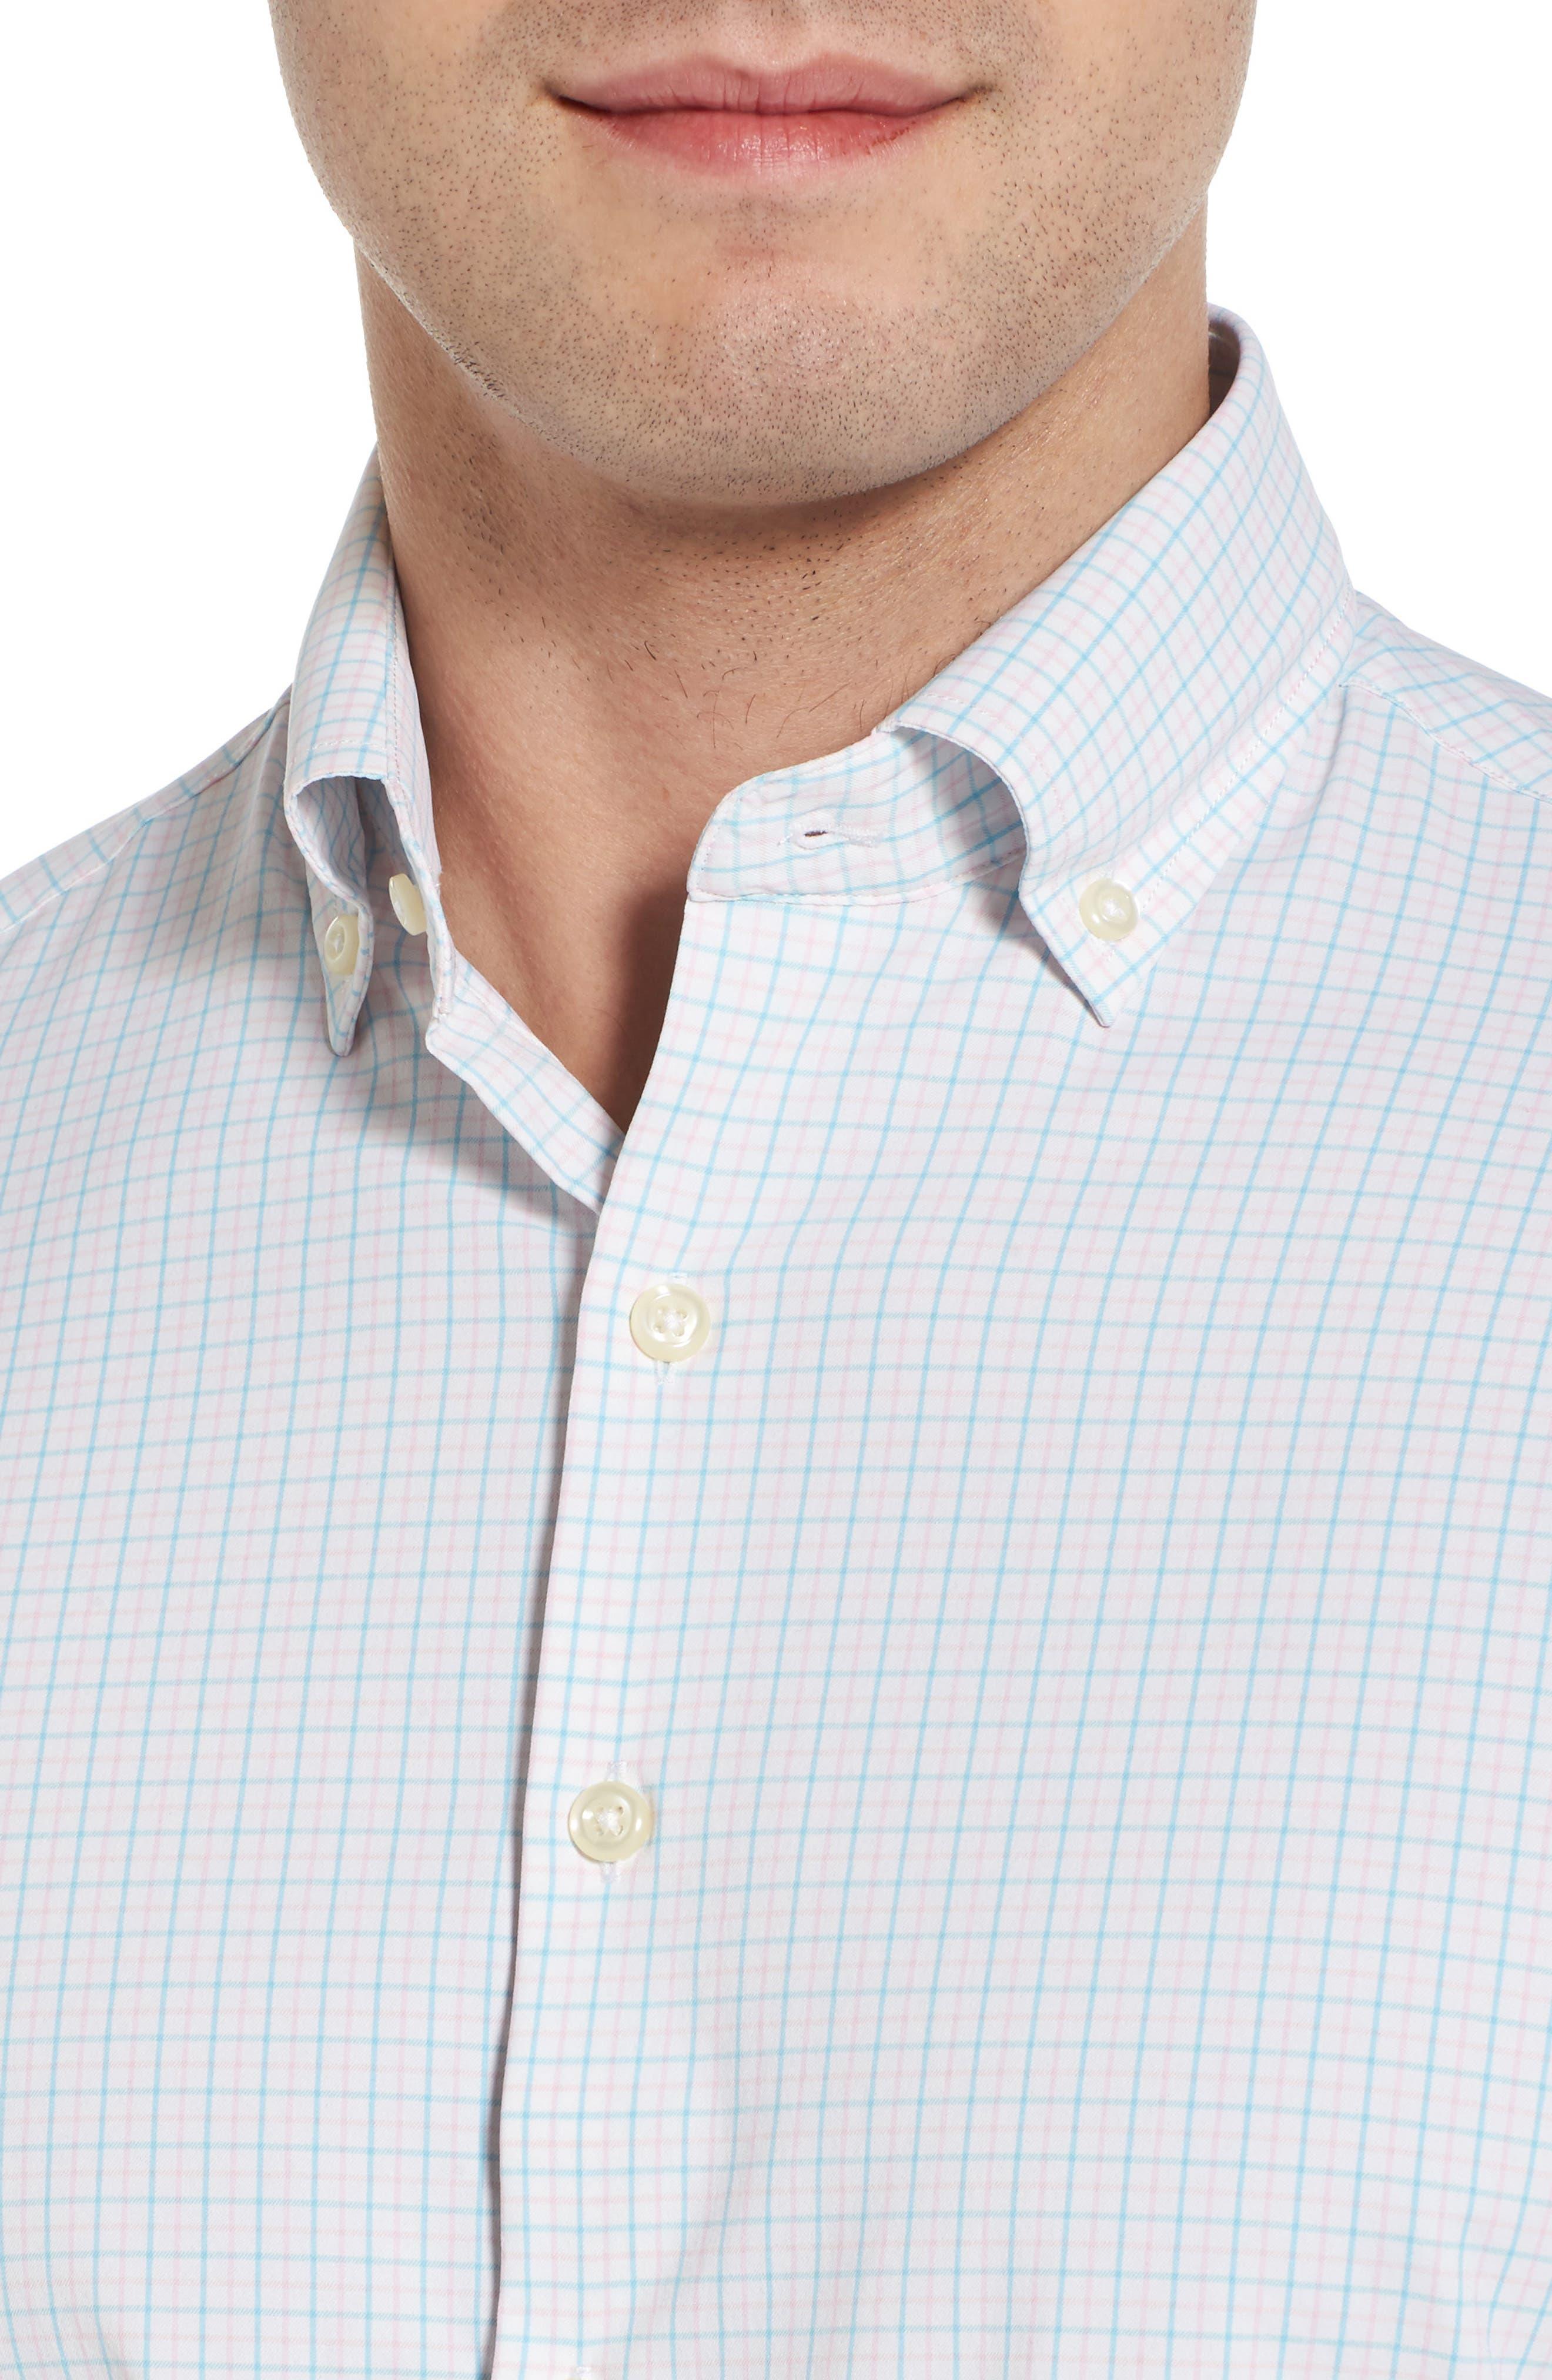 Waldorf Regular Fit Tattersall Performance Sport Shirt,                             Alternate thumbnail 2, color,                             White/ Piglet Pink